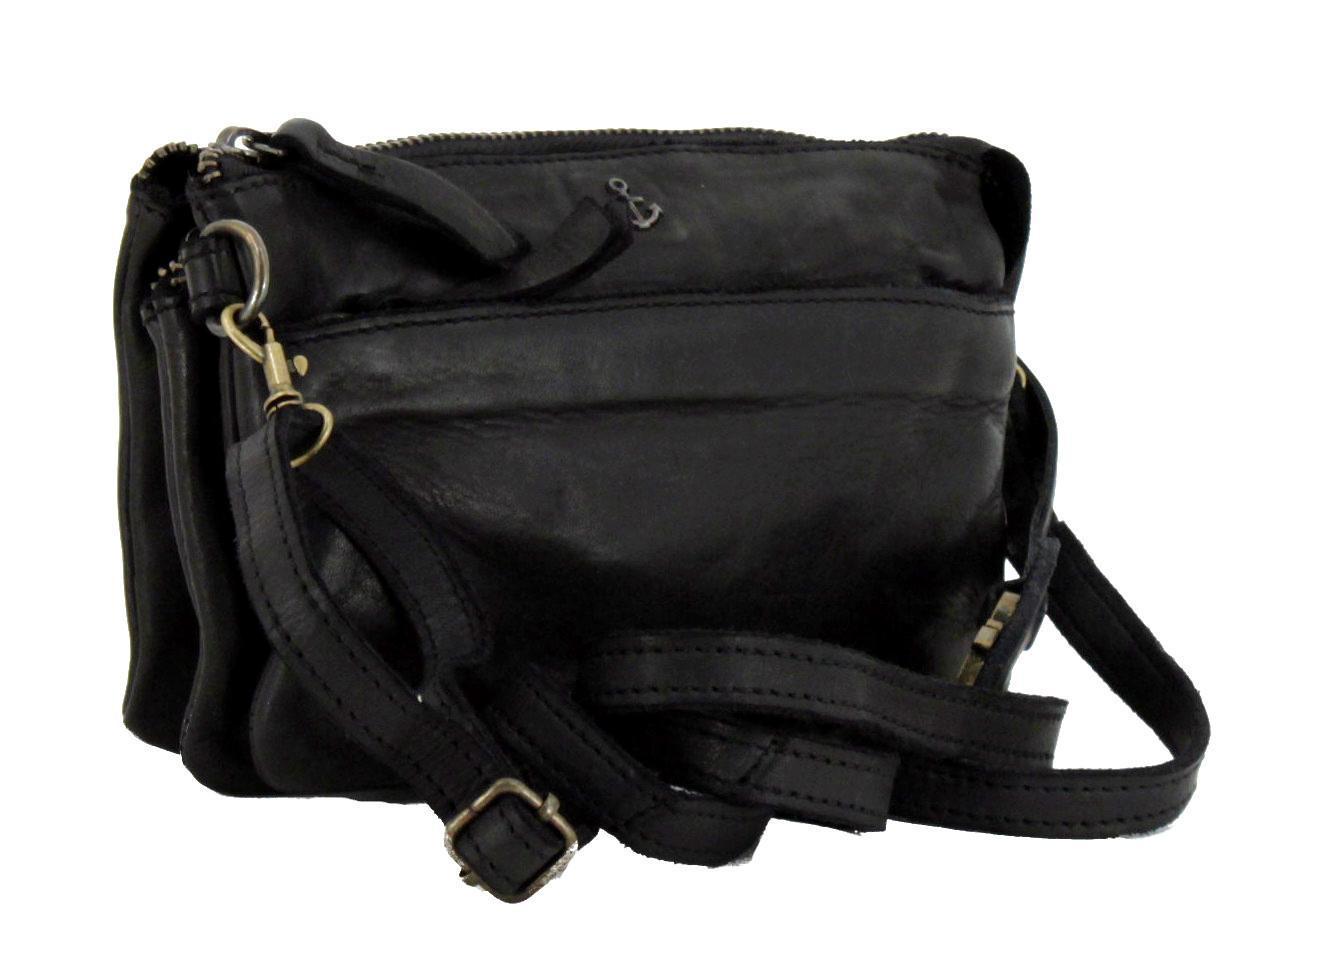 Ledertäschchen Perla Harbour2nd schwarz Ash Bum Bag